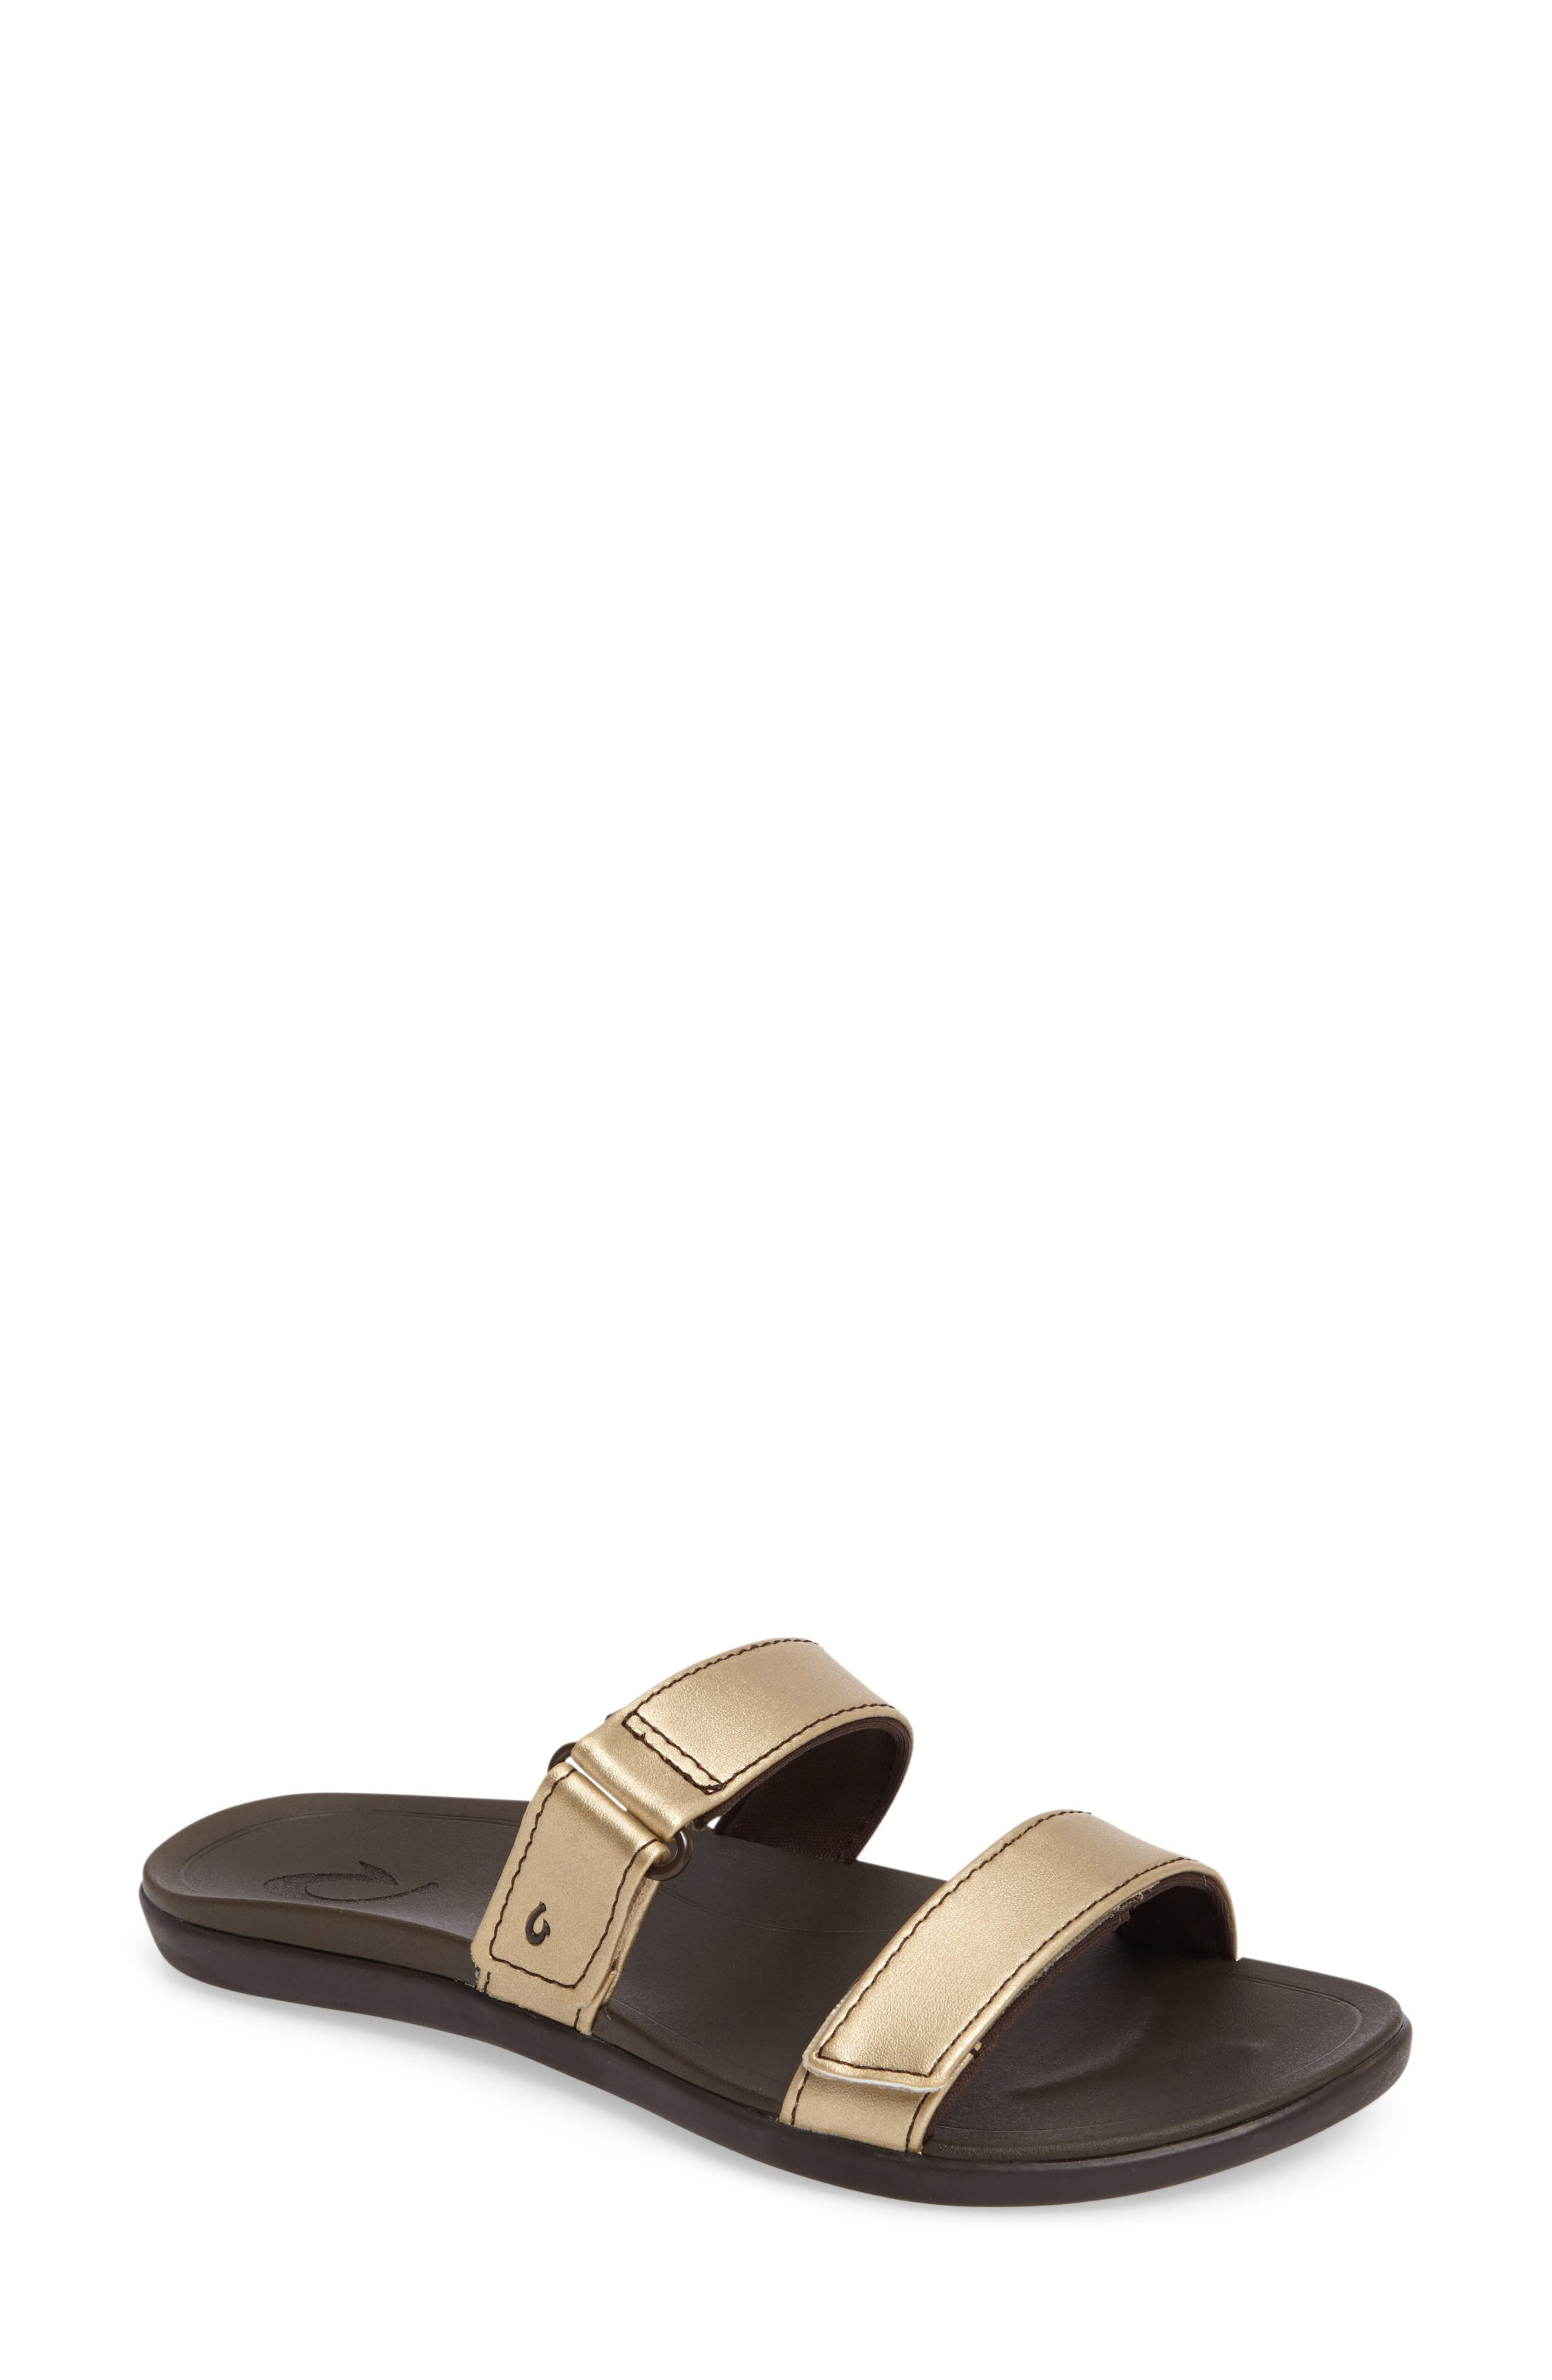 Kipuka Slide Sandal,                         Main,                         color, BUBBLY/ JAVA FAUX LEATHER